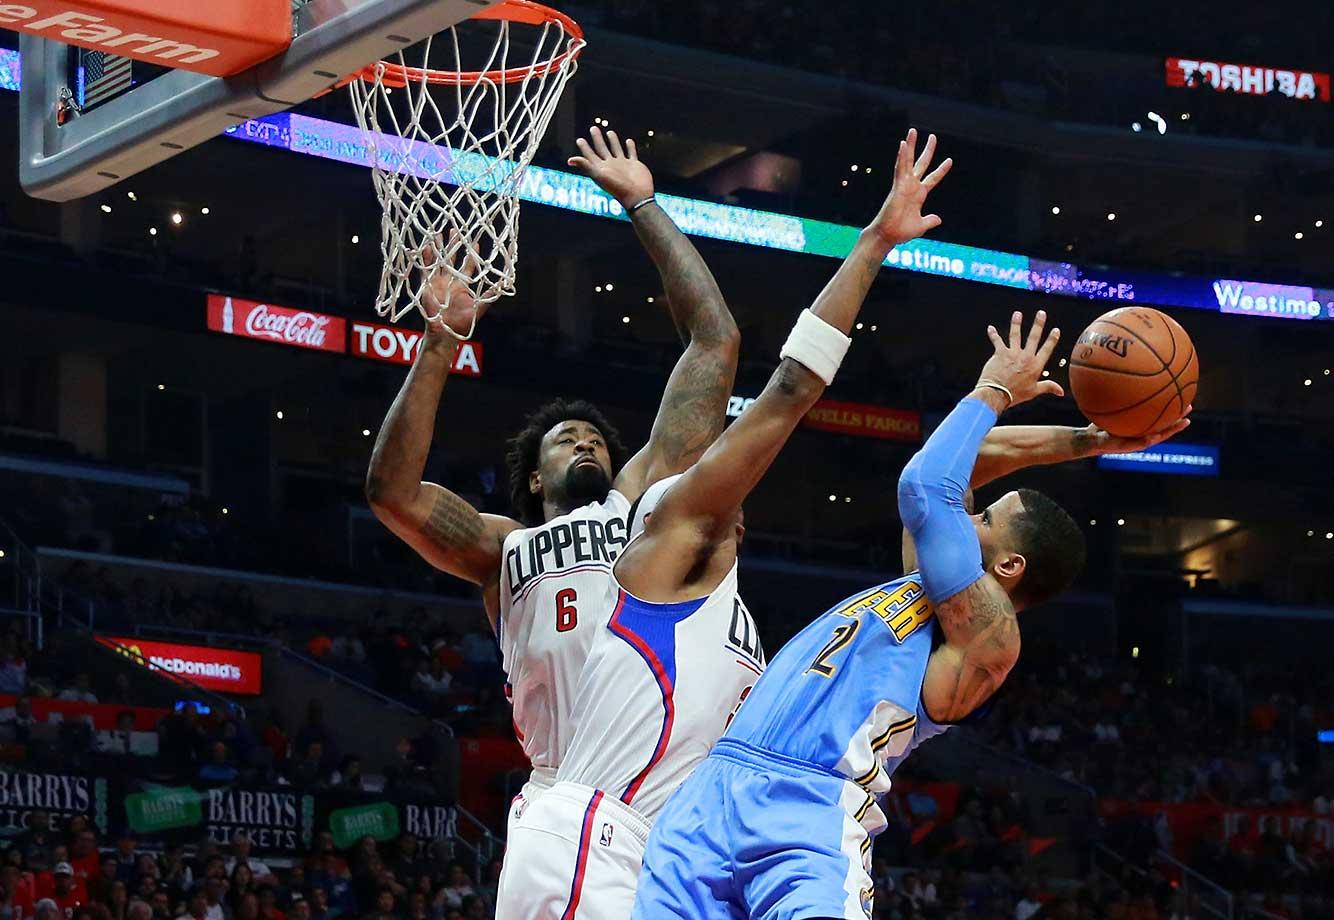 DeAndre Jordan (6) and teammate Paul Pierce defend a shot by D.J. Augustin of the Denver Nuggets.